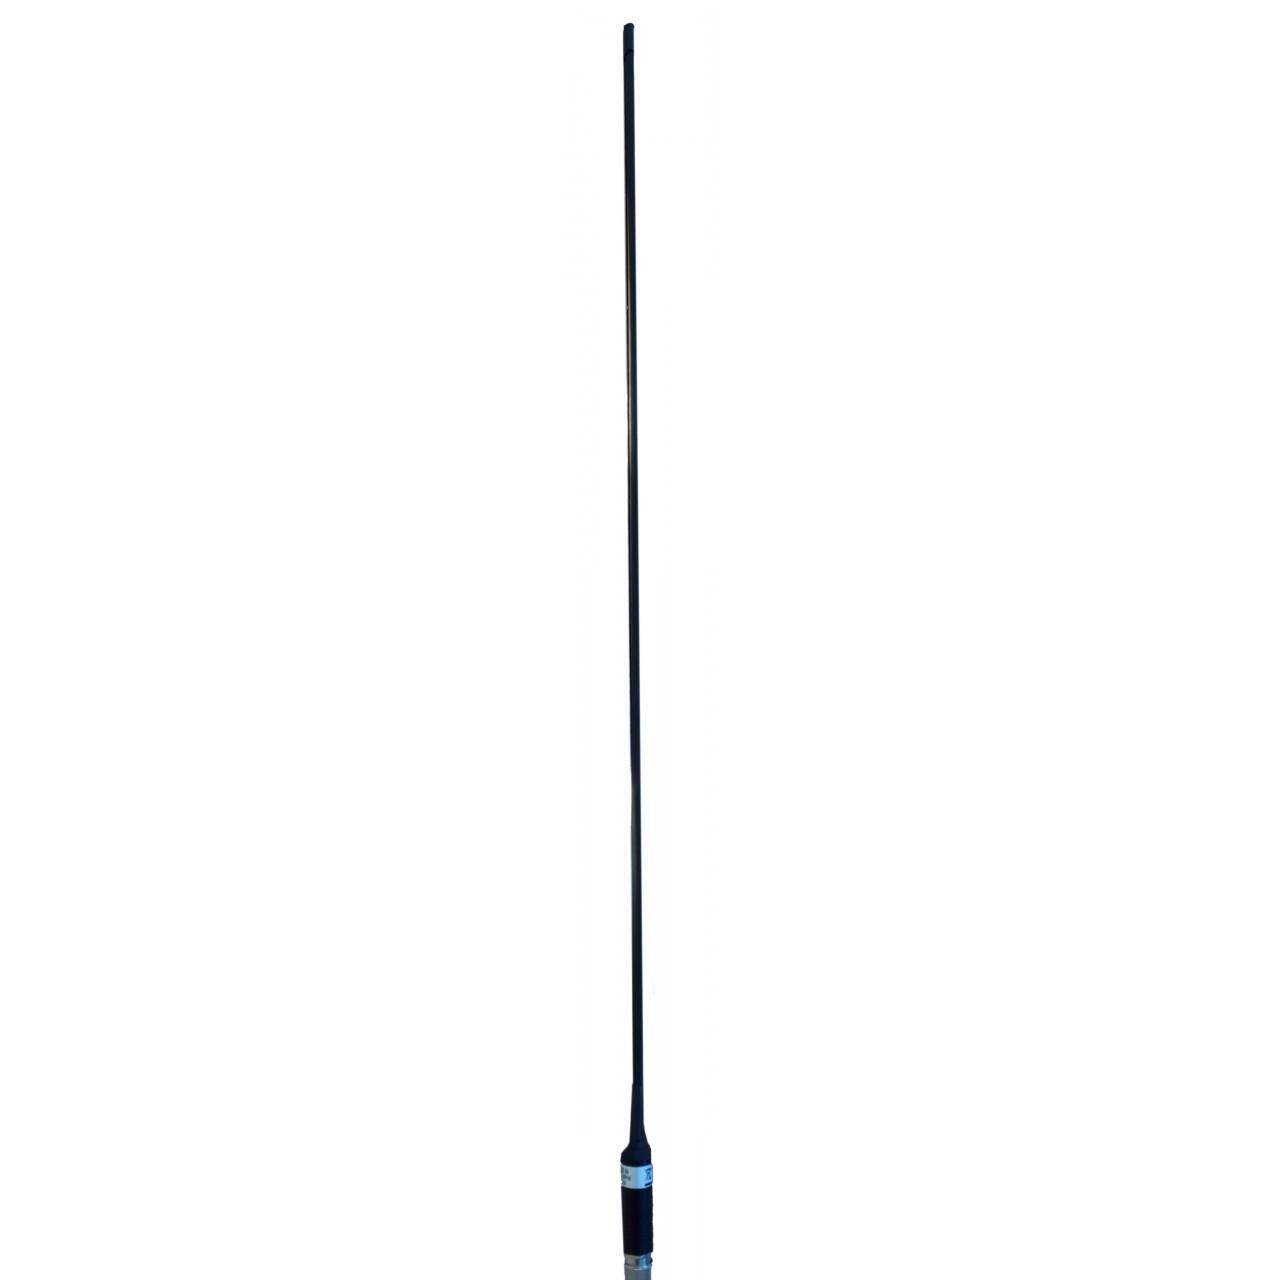 AH-SB3-1-2-118-136 Antennes - ICOM